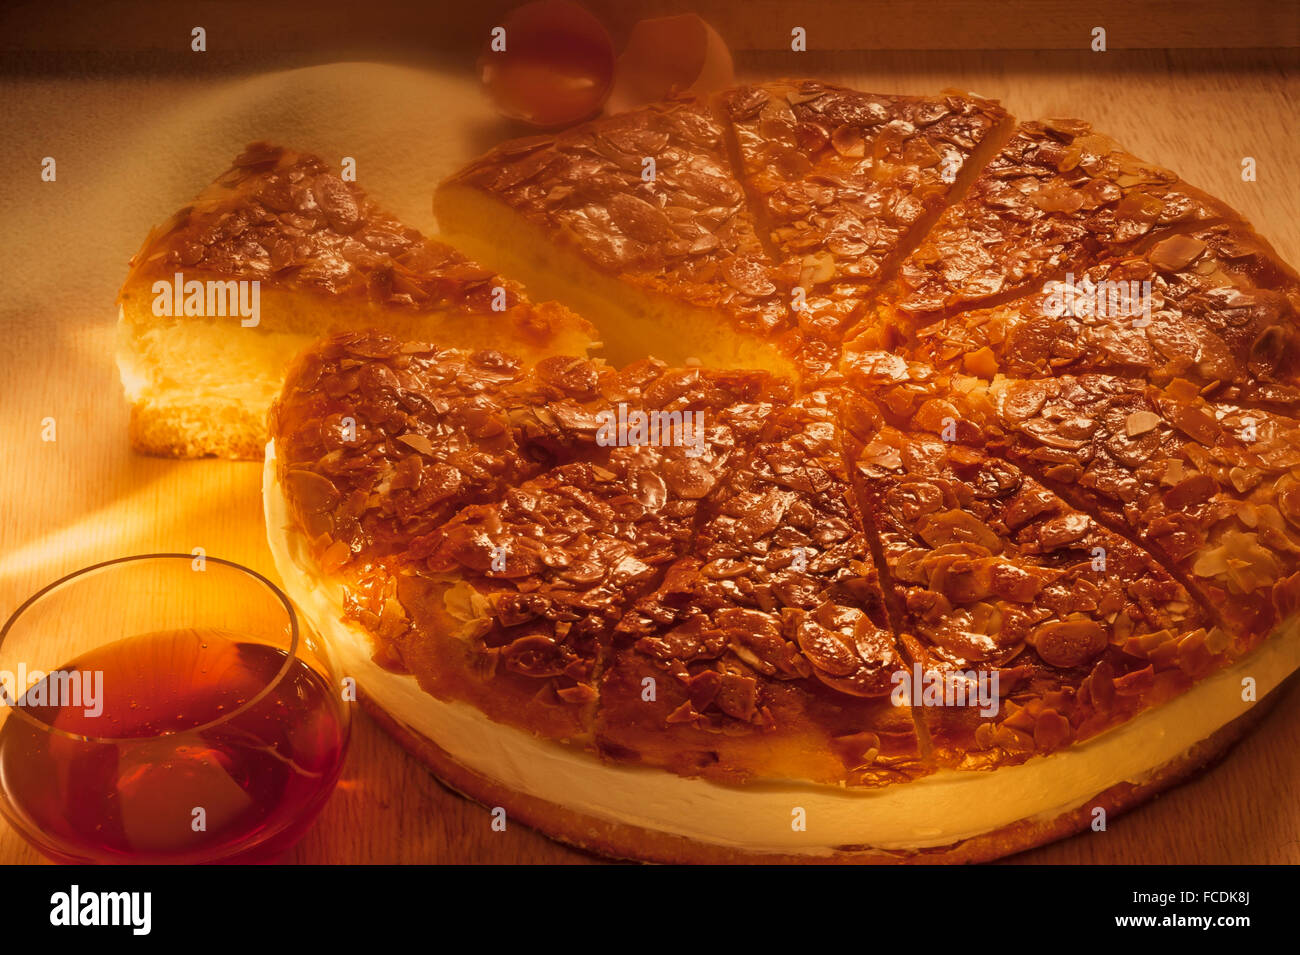 Freshly baked Bienenstich or Bee sting cake - Stock Image